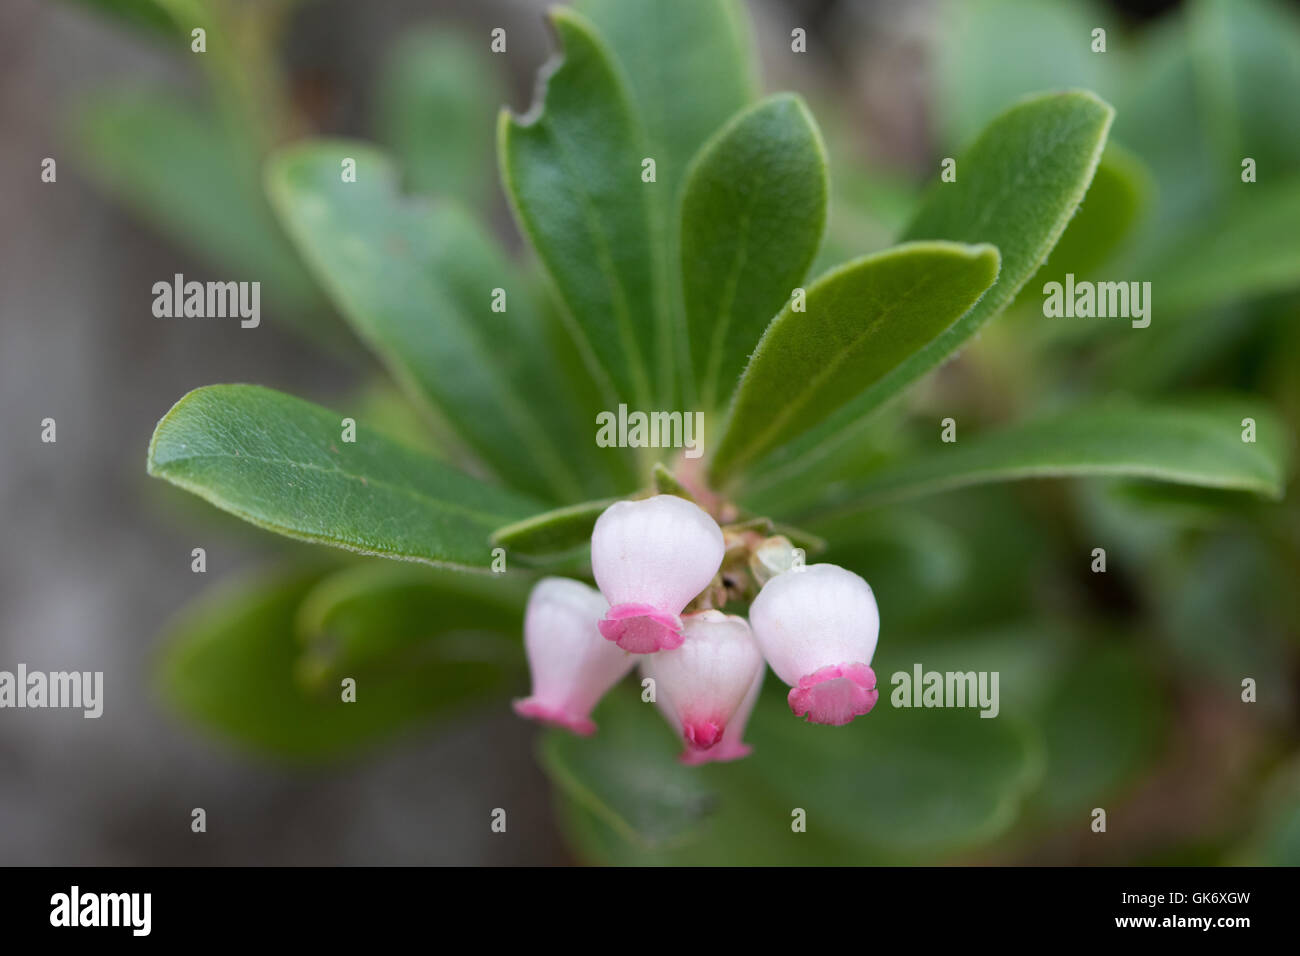 Bearberry (Arctostaphylos uva-ursi) flowers - Stock Image